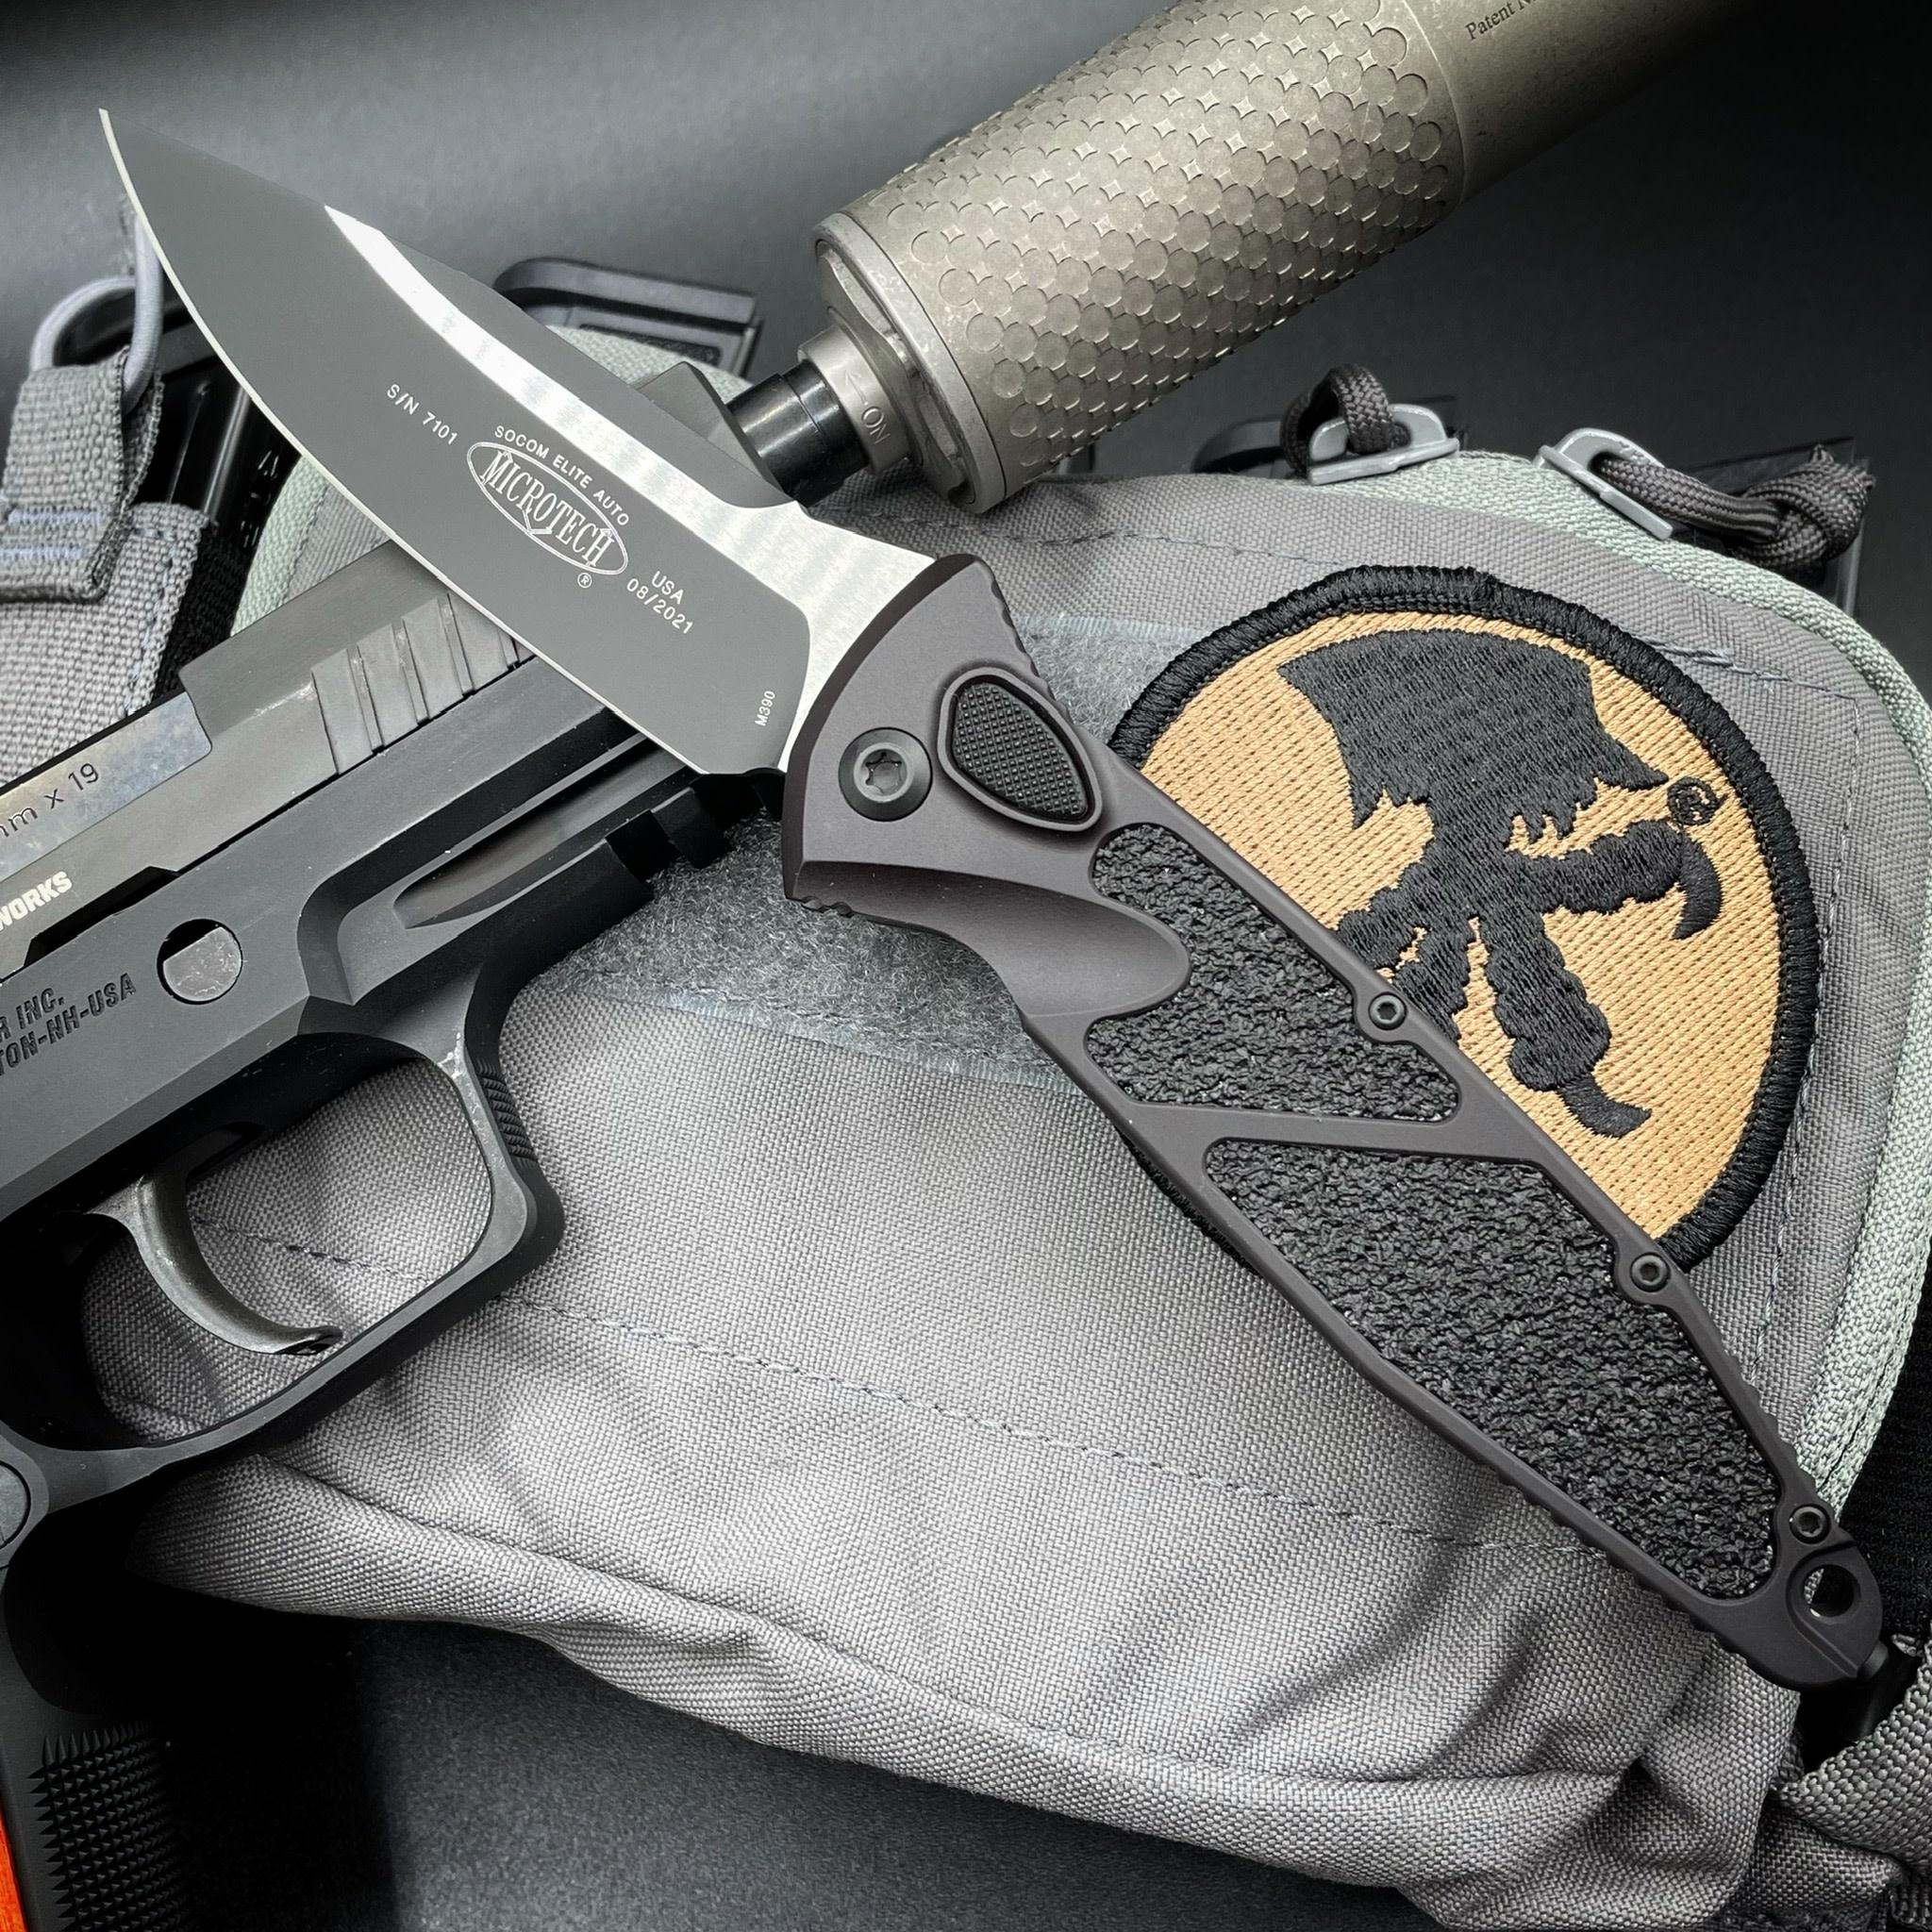 Microtech SOCOM ELITE Auto, tactical black, blade - single edge, black